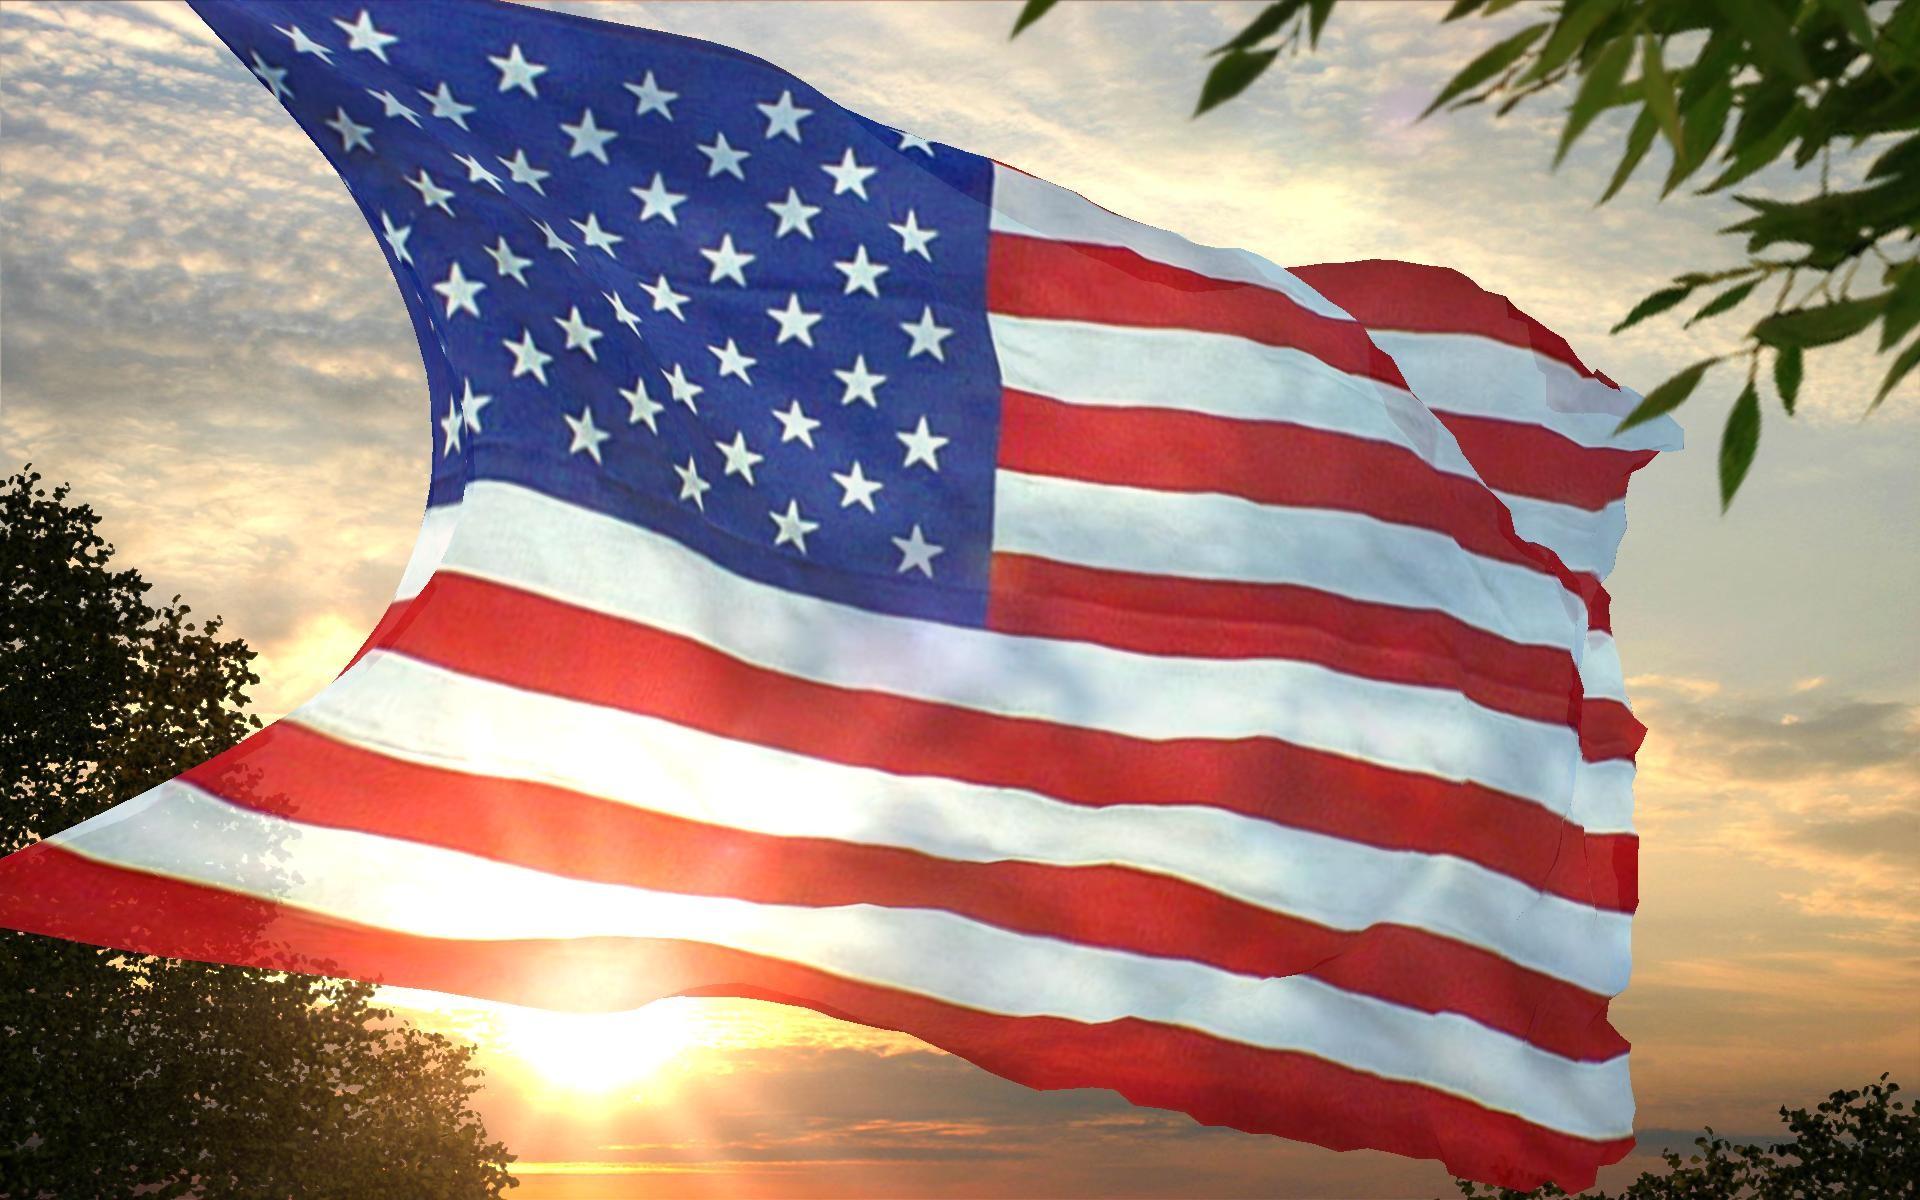 Res: 1920x1200, USA American Flag Wallpaper